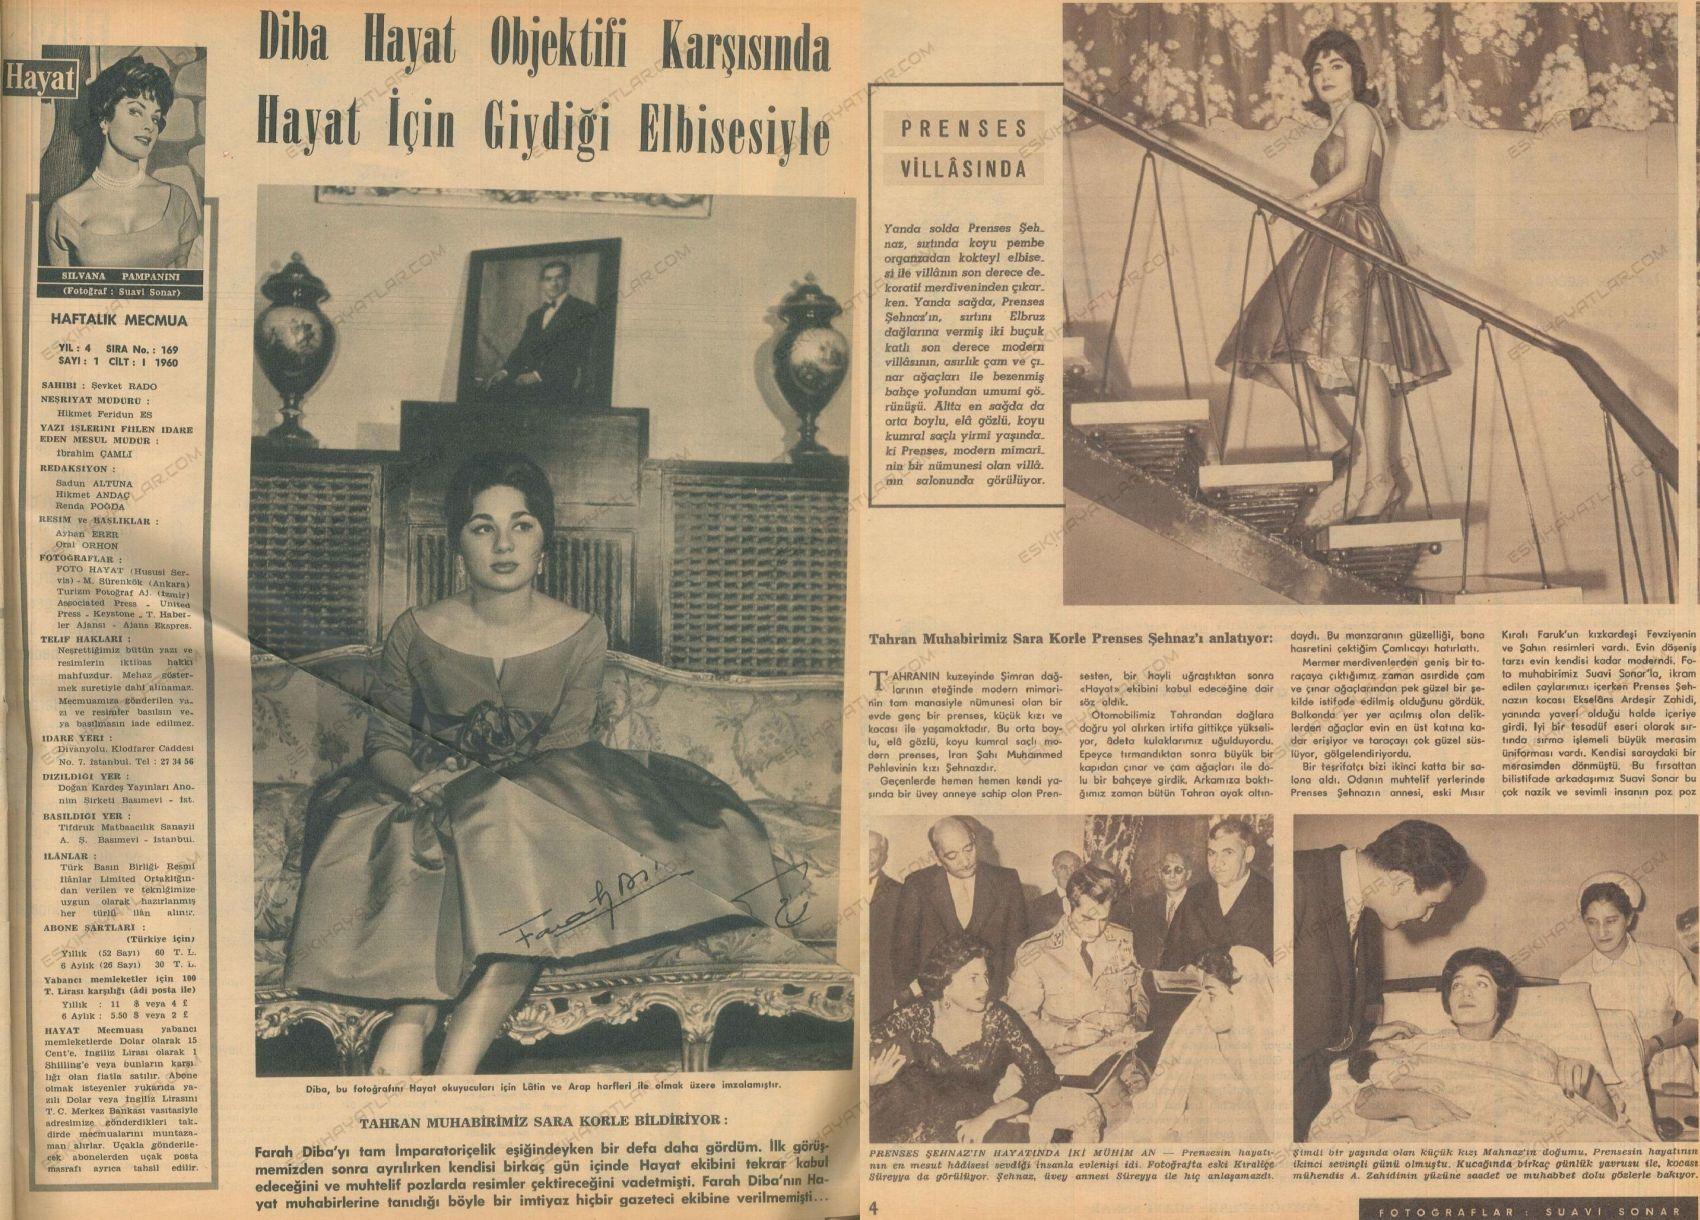 0196-hayat-dergisi-1960-suavi-sonar-fotograflari-farah-diba-prenses-sehnaz-dugunu (1)